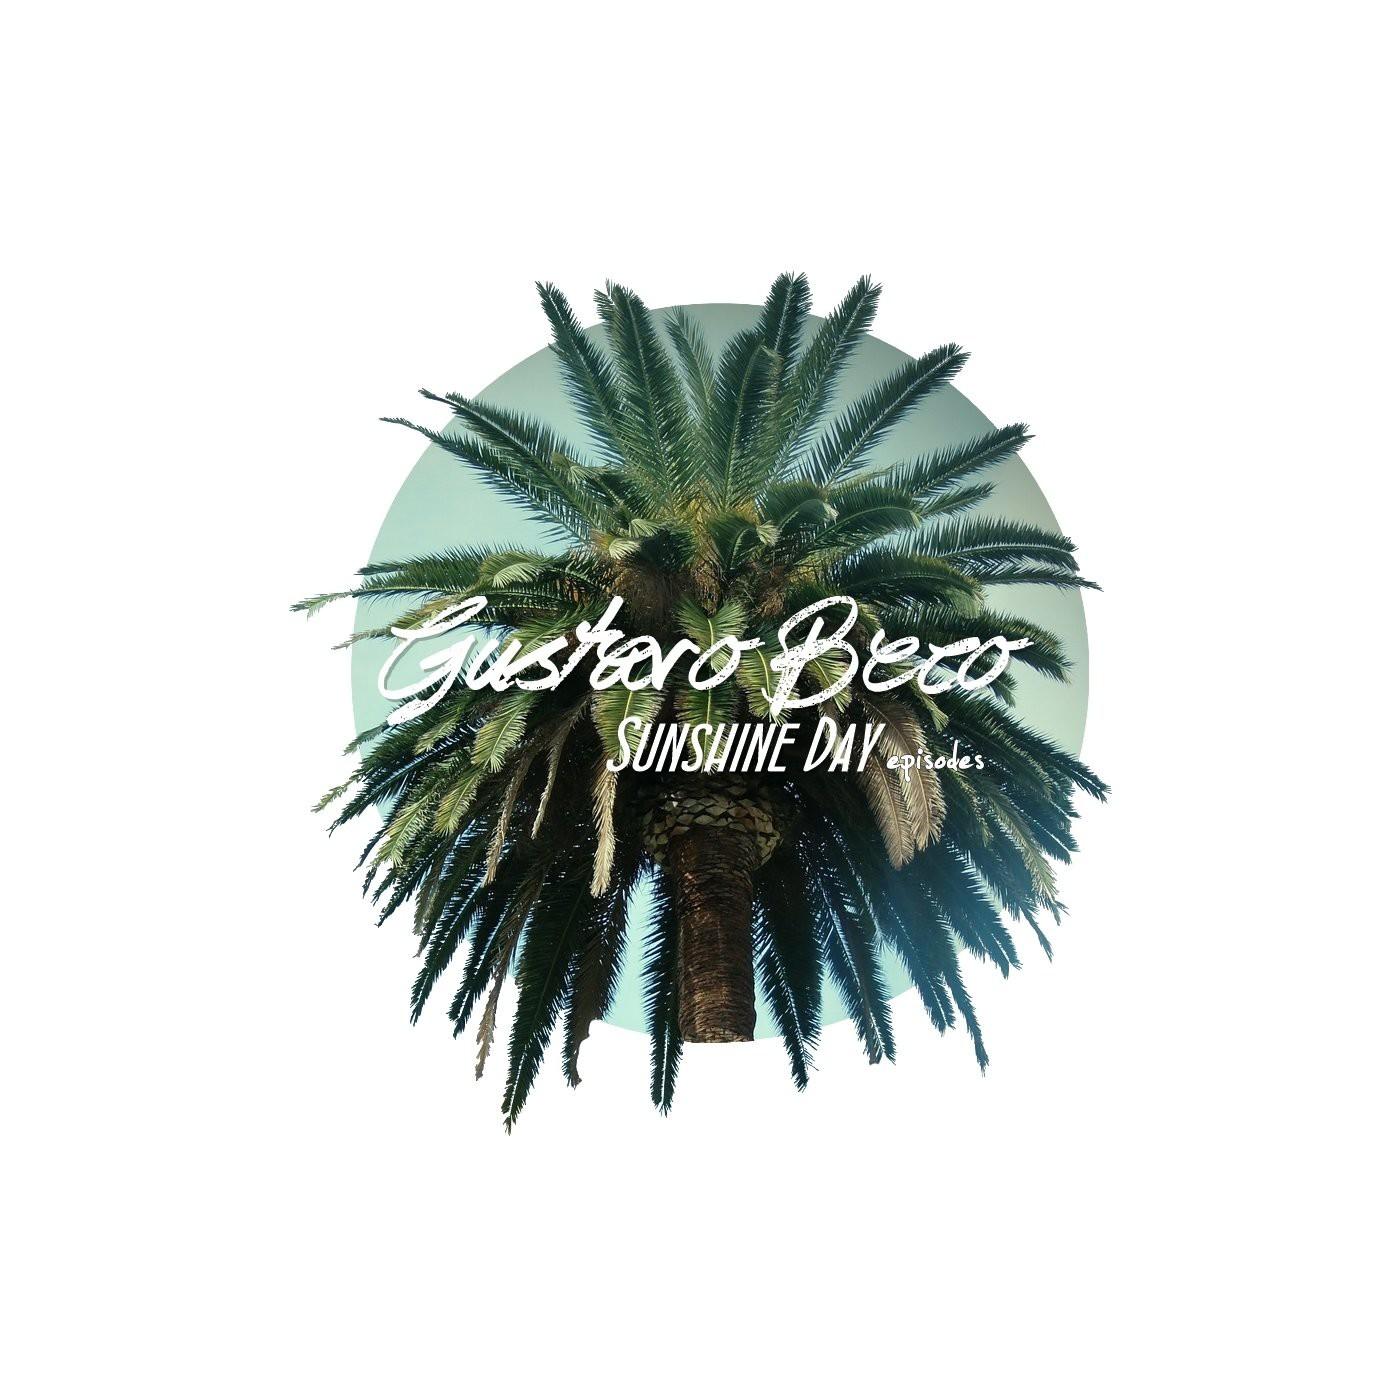 Gustavo Beco Presents Sunshine Day Episodes